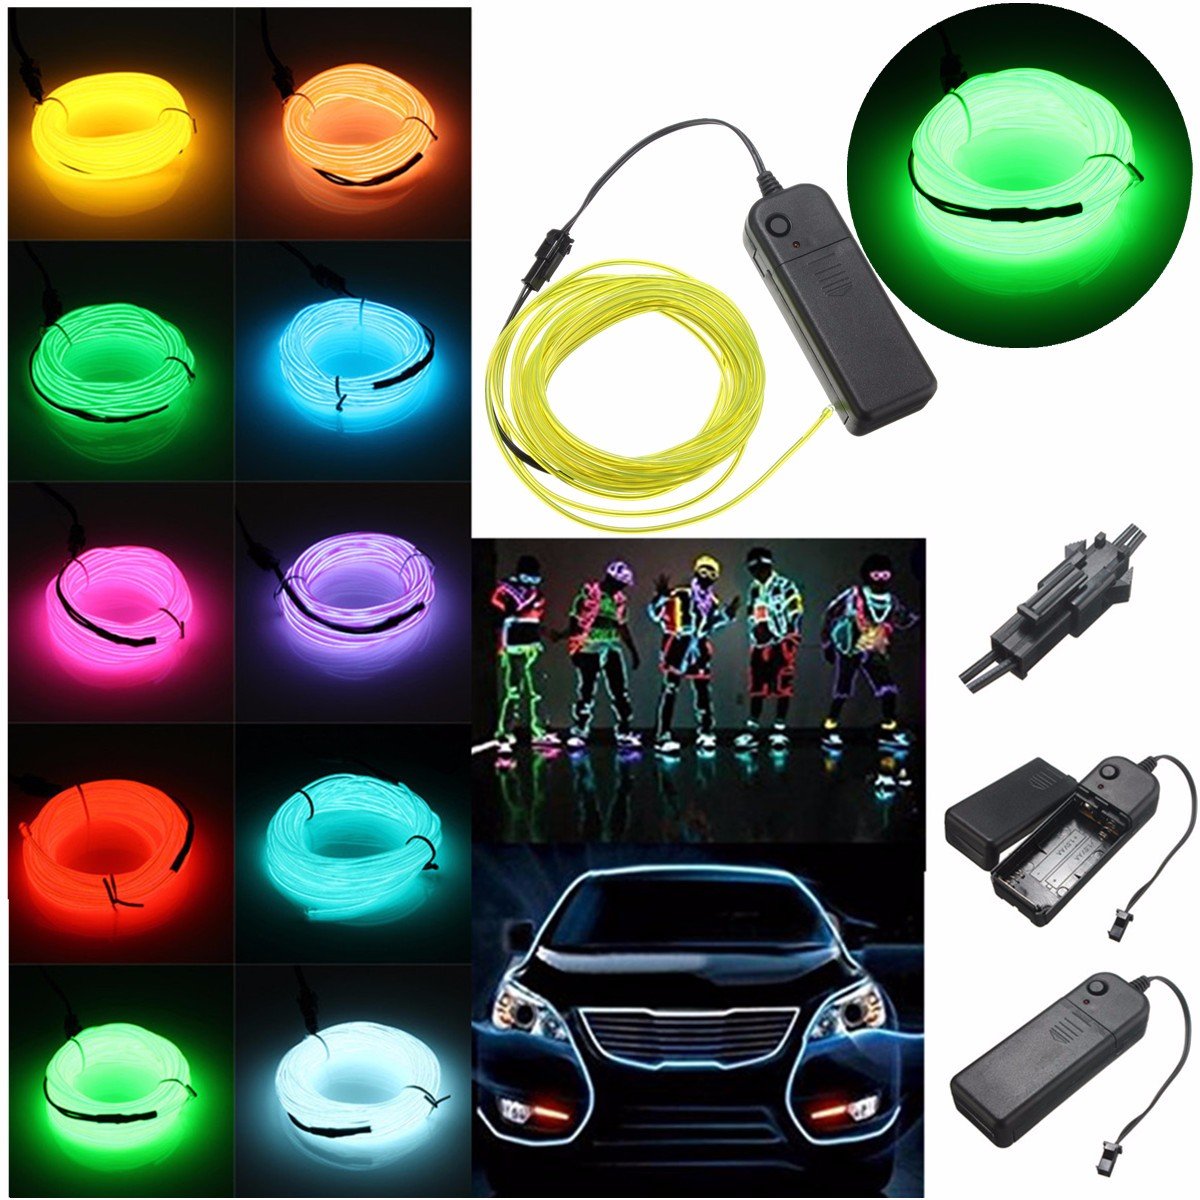 5M 3V Flexible Neon EL Wire Light Dance Party Decor Lighting Light Glow LED Light Energy-saving String Strip Rope LED Strip